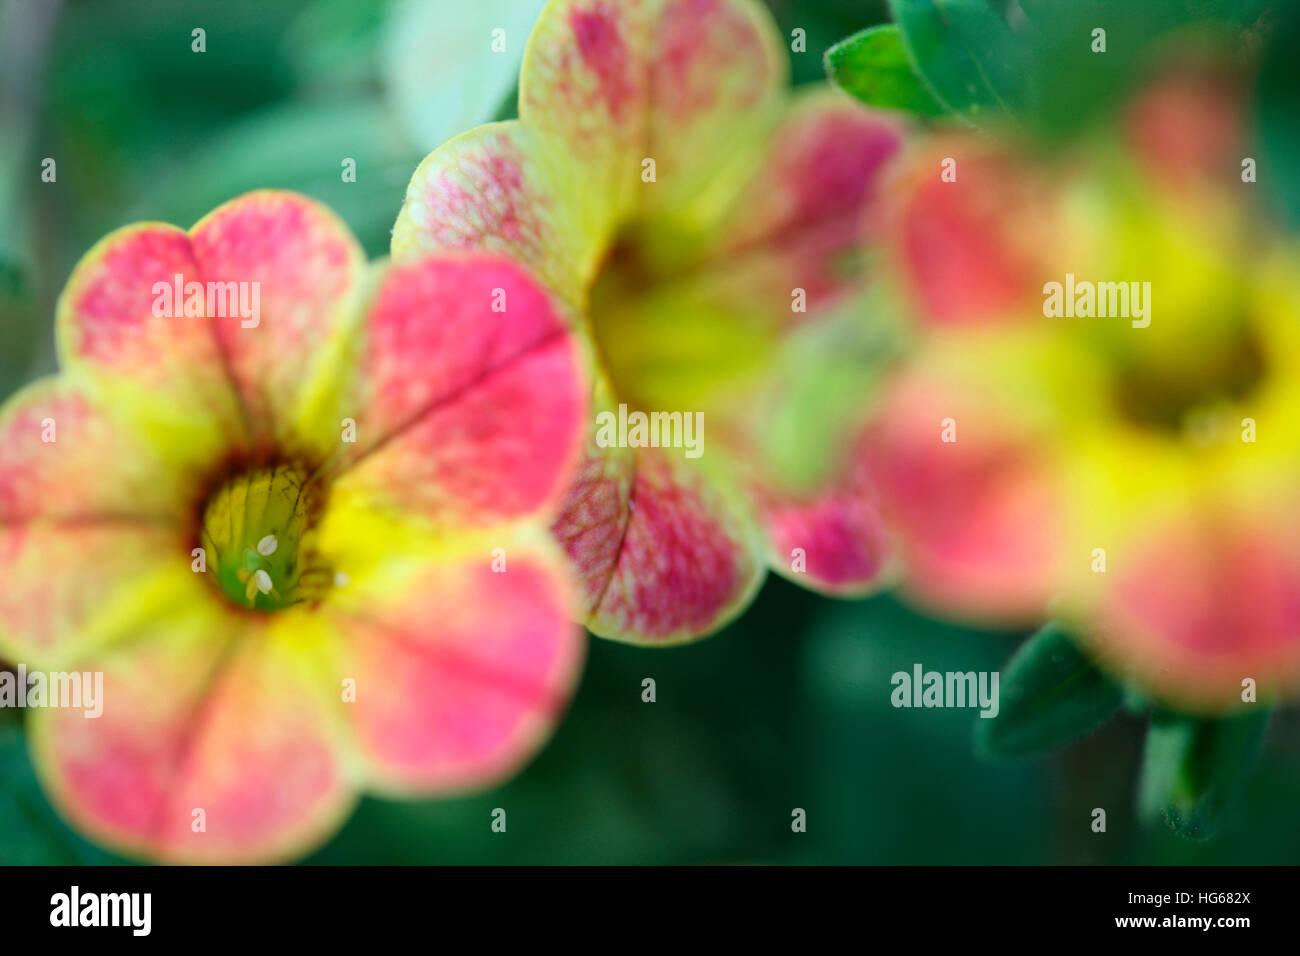 calibrachoa chameleon, sunshine berry, multi coloured mini-petunia flowers Jane Ann Butler Photography JABP1766 - Stock Image